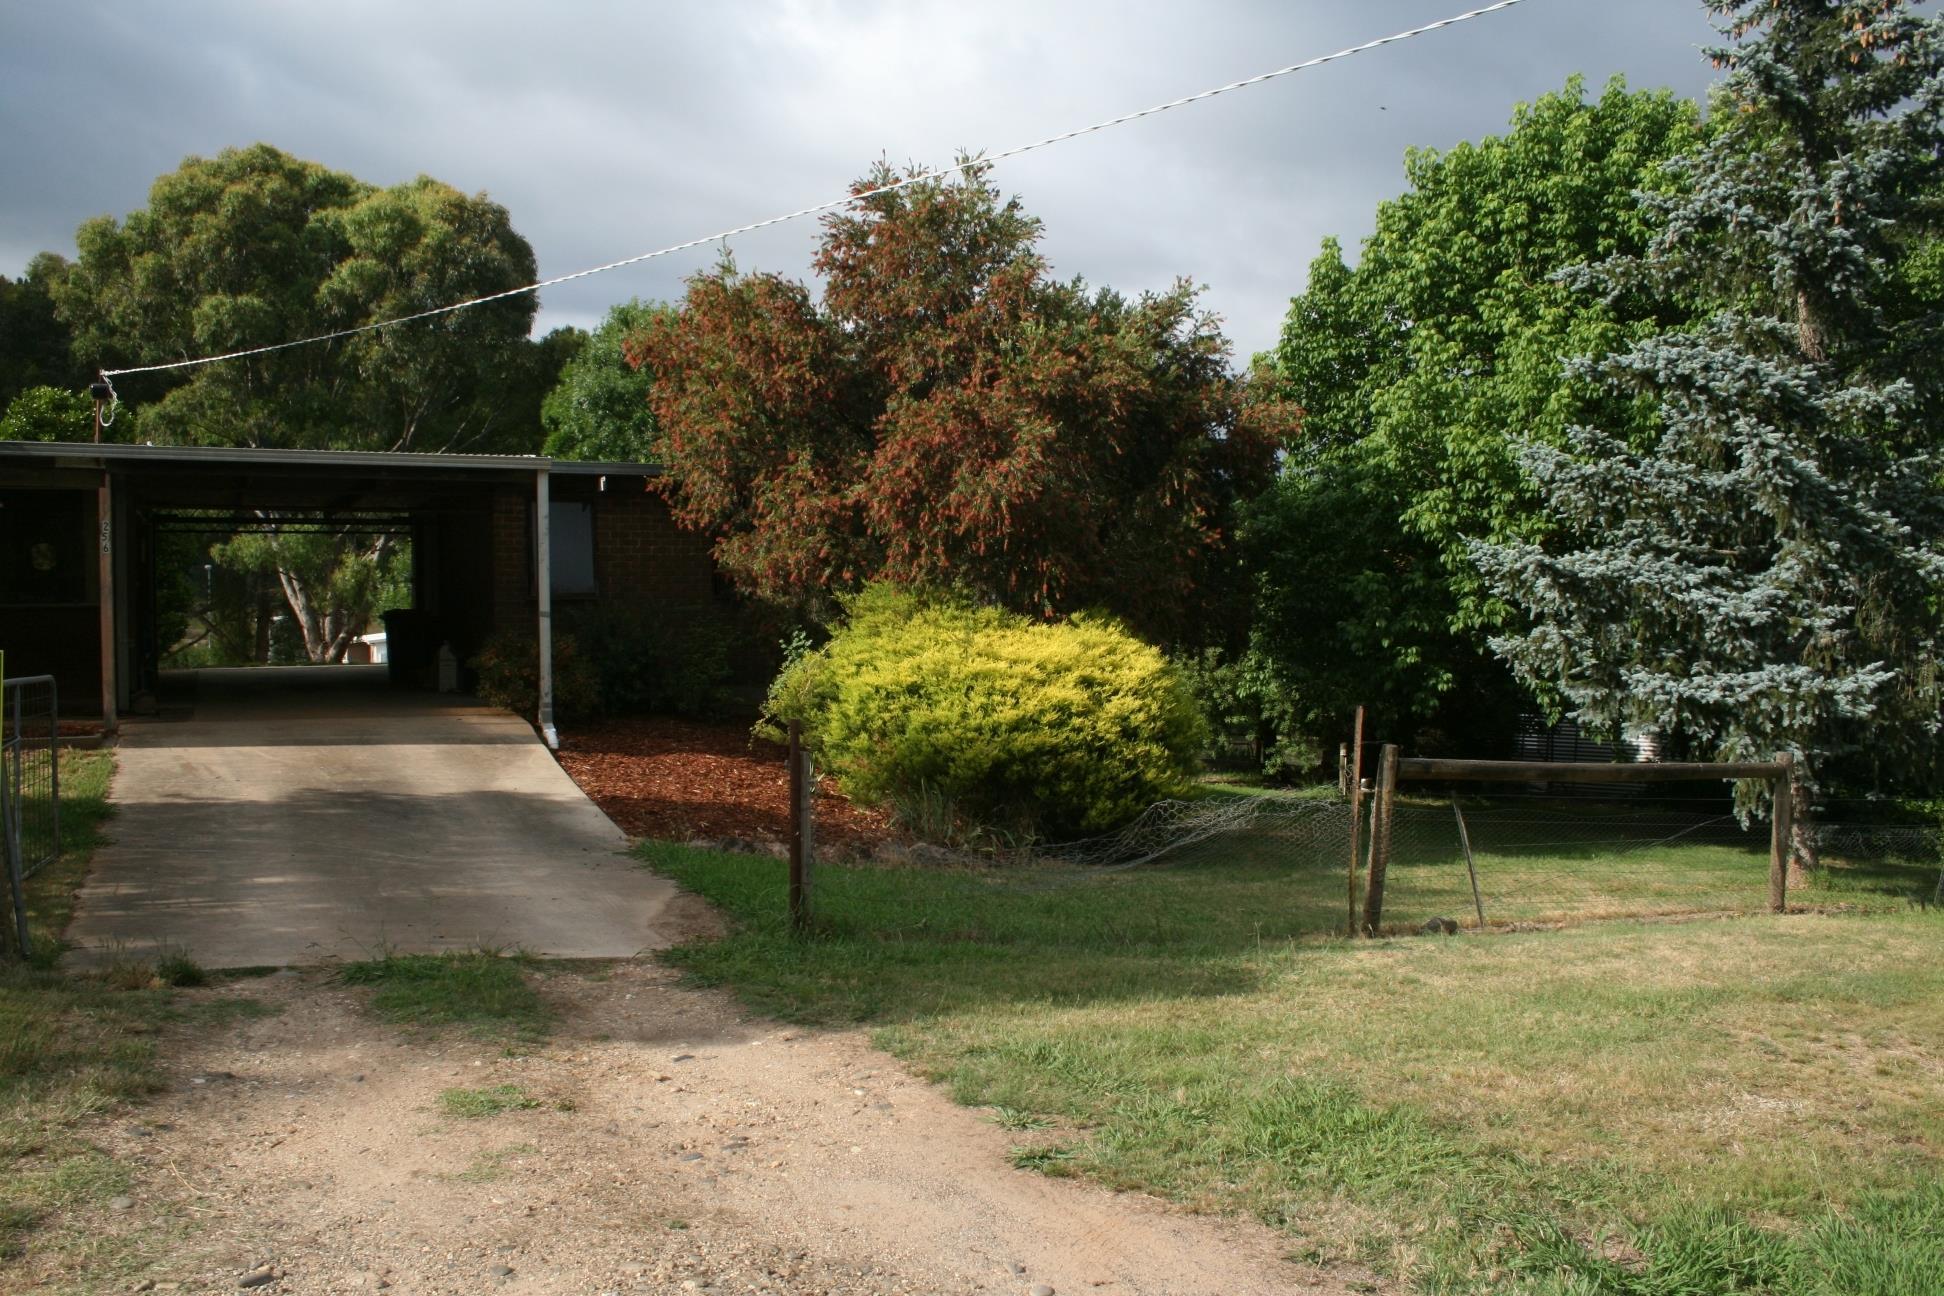 256 mummery road myrtleford vic 3737 sale rental history